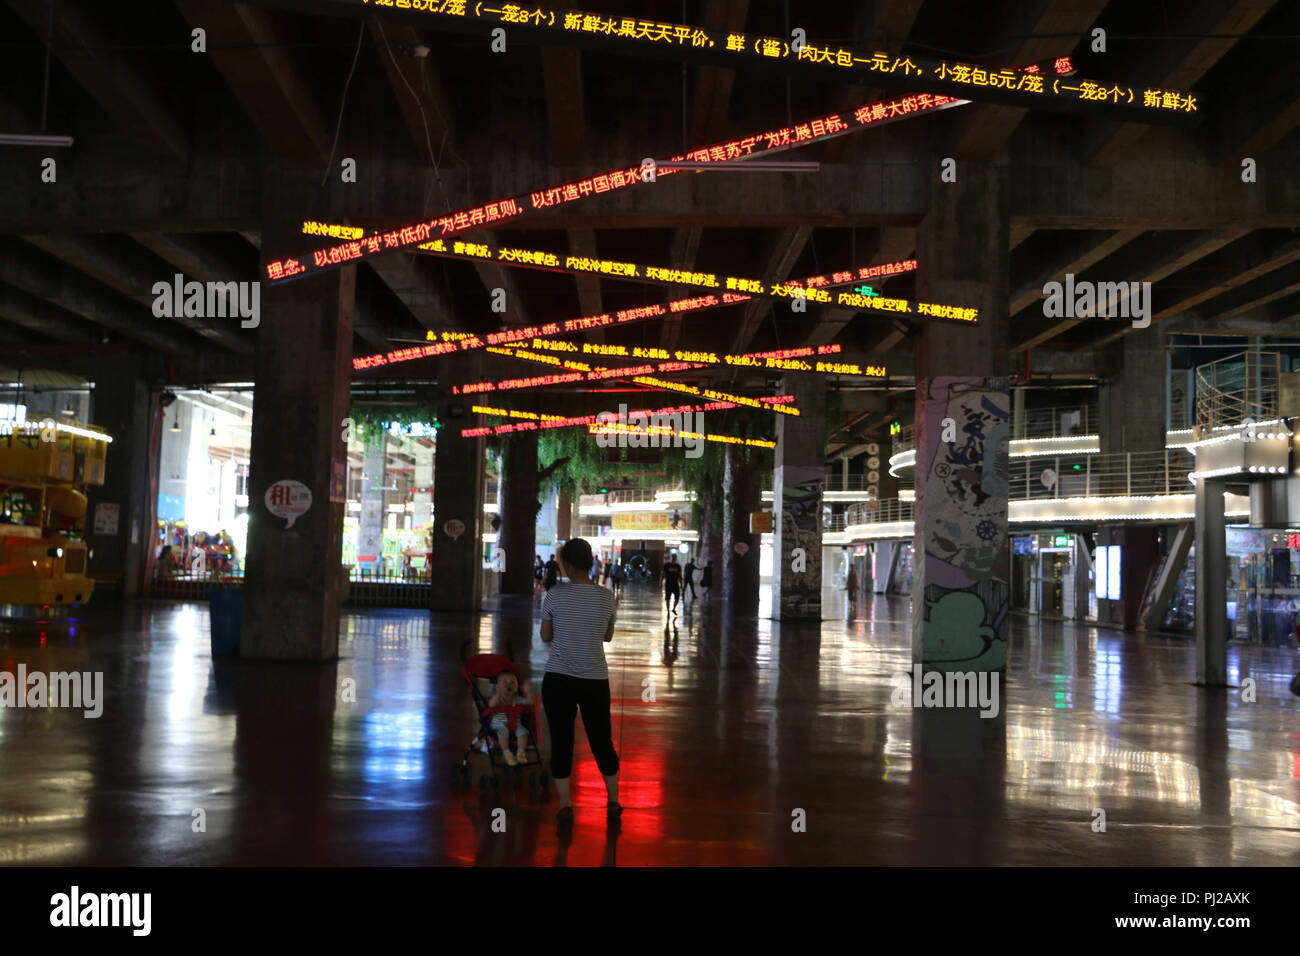 Chongqin, Chongqin, China. 4th Sep, 2018. Chongqing, CHINA-The messiest billboards can be seen in southwest China's Chongqing. Credit: SIPA Asia/ZUMA Wire/Alamy Live News - Stock Image